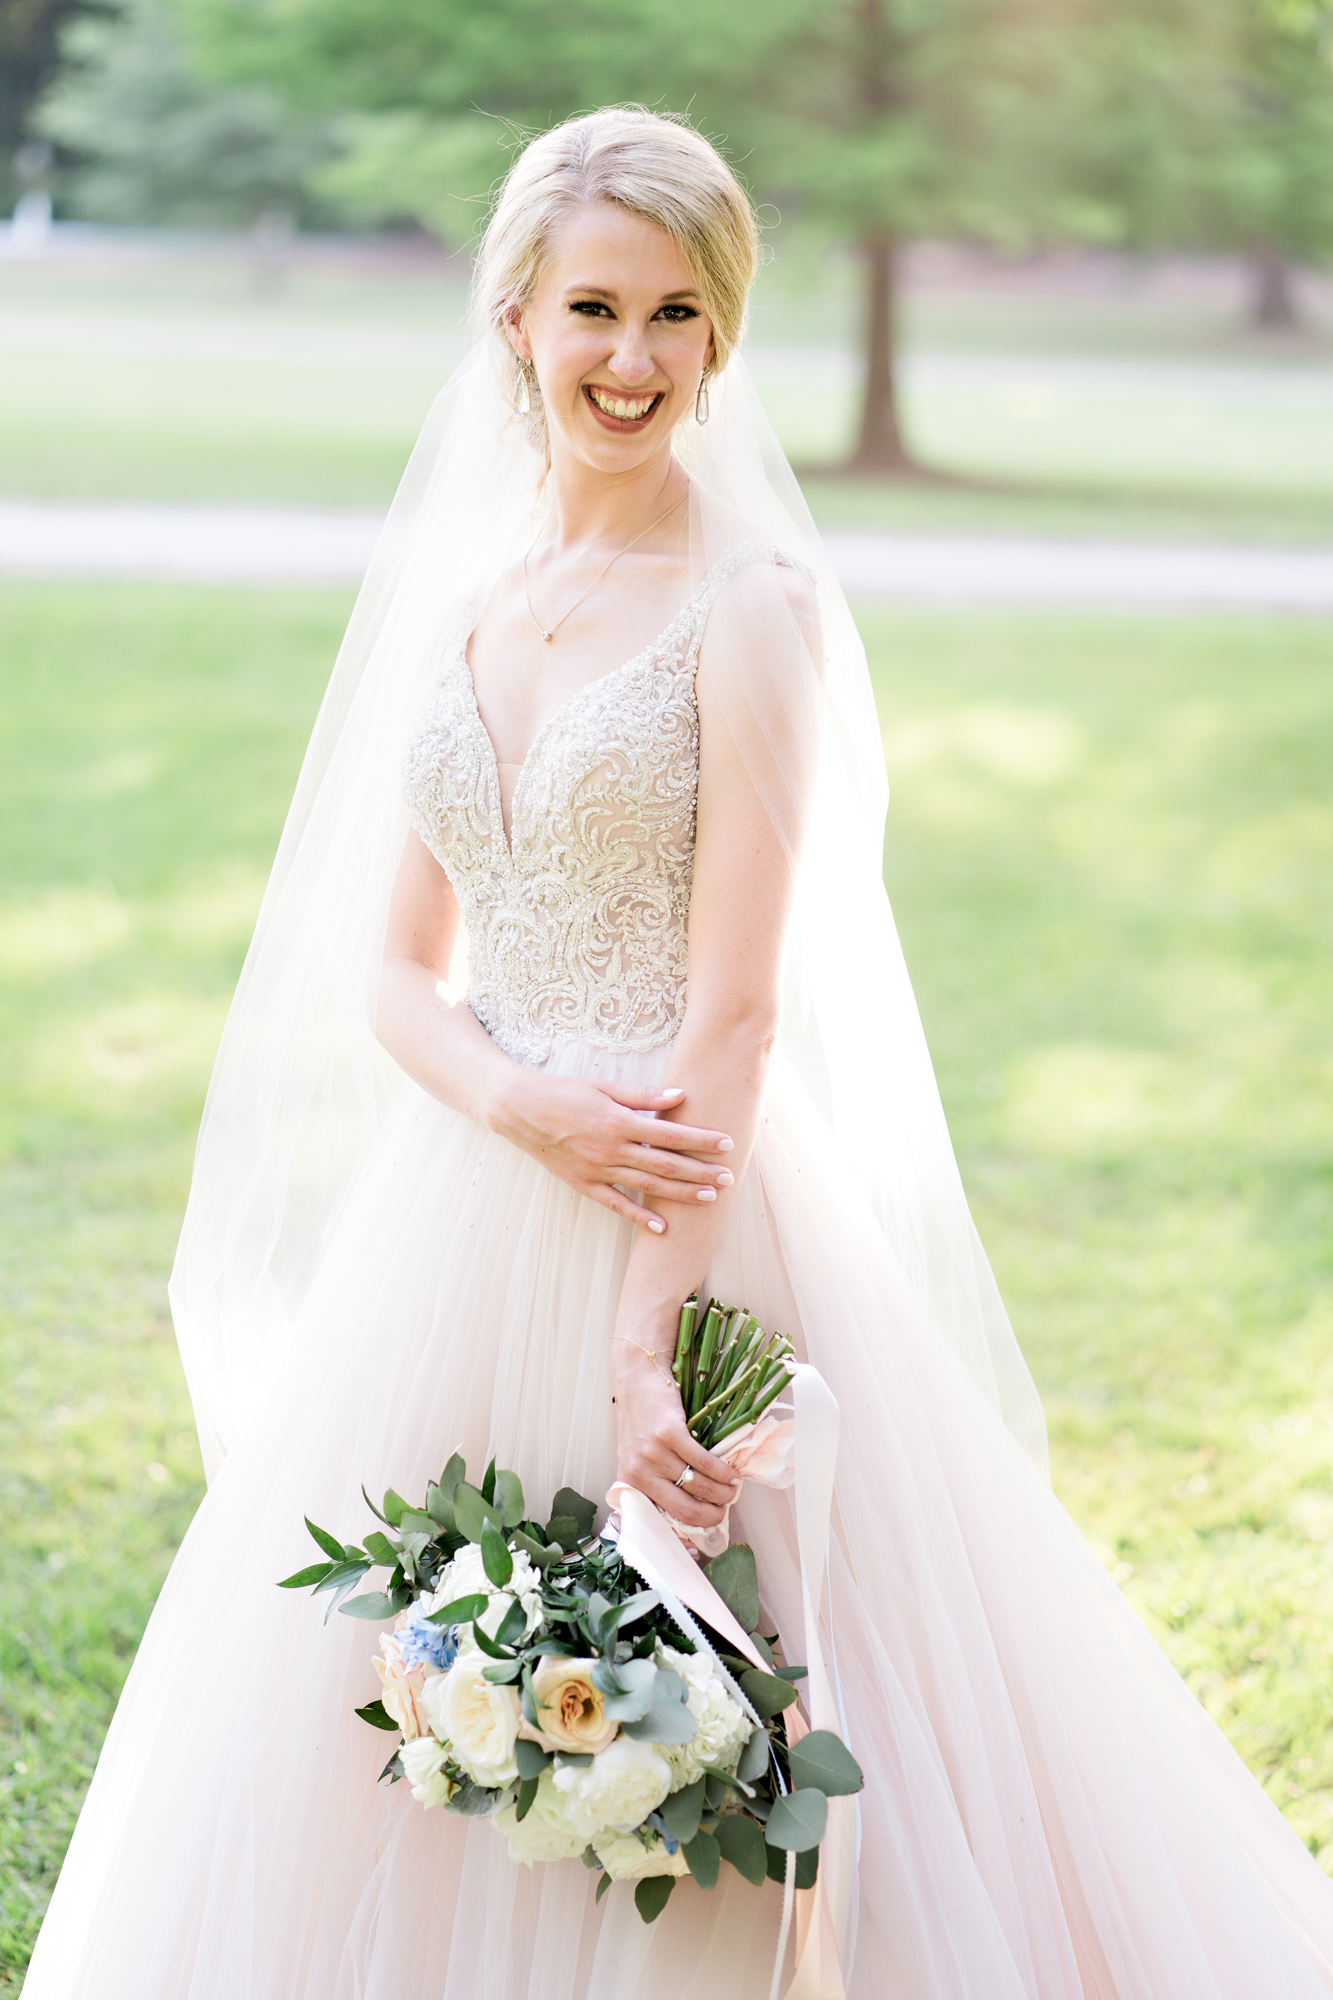 Alabama-Photographers-Nick-Drollette-Wedding-Photography-154.jpg